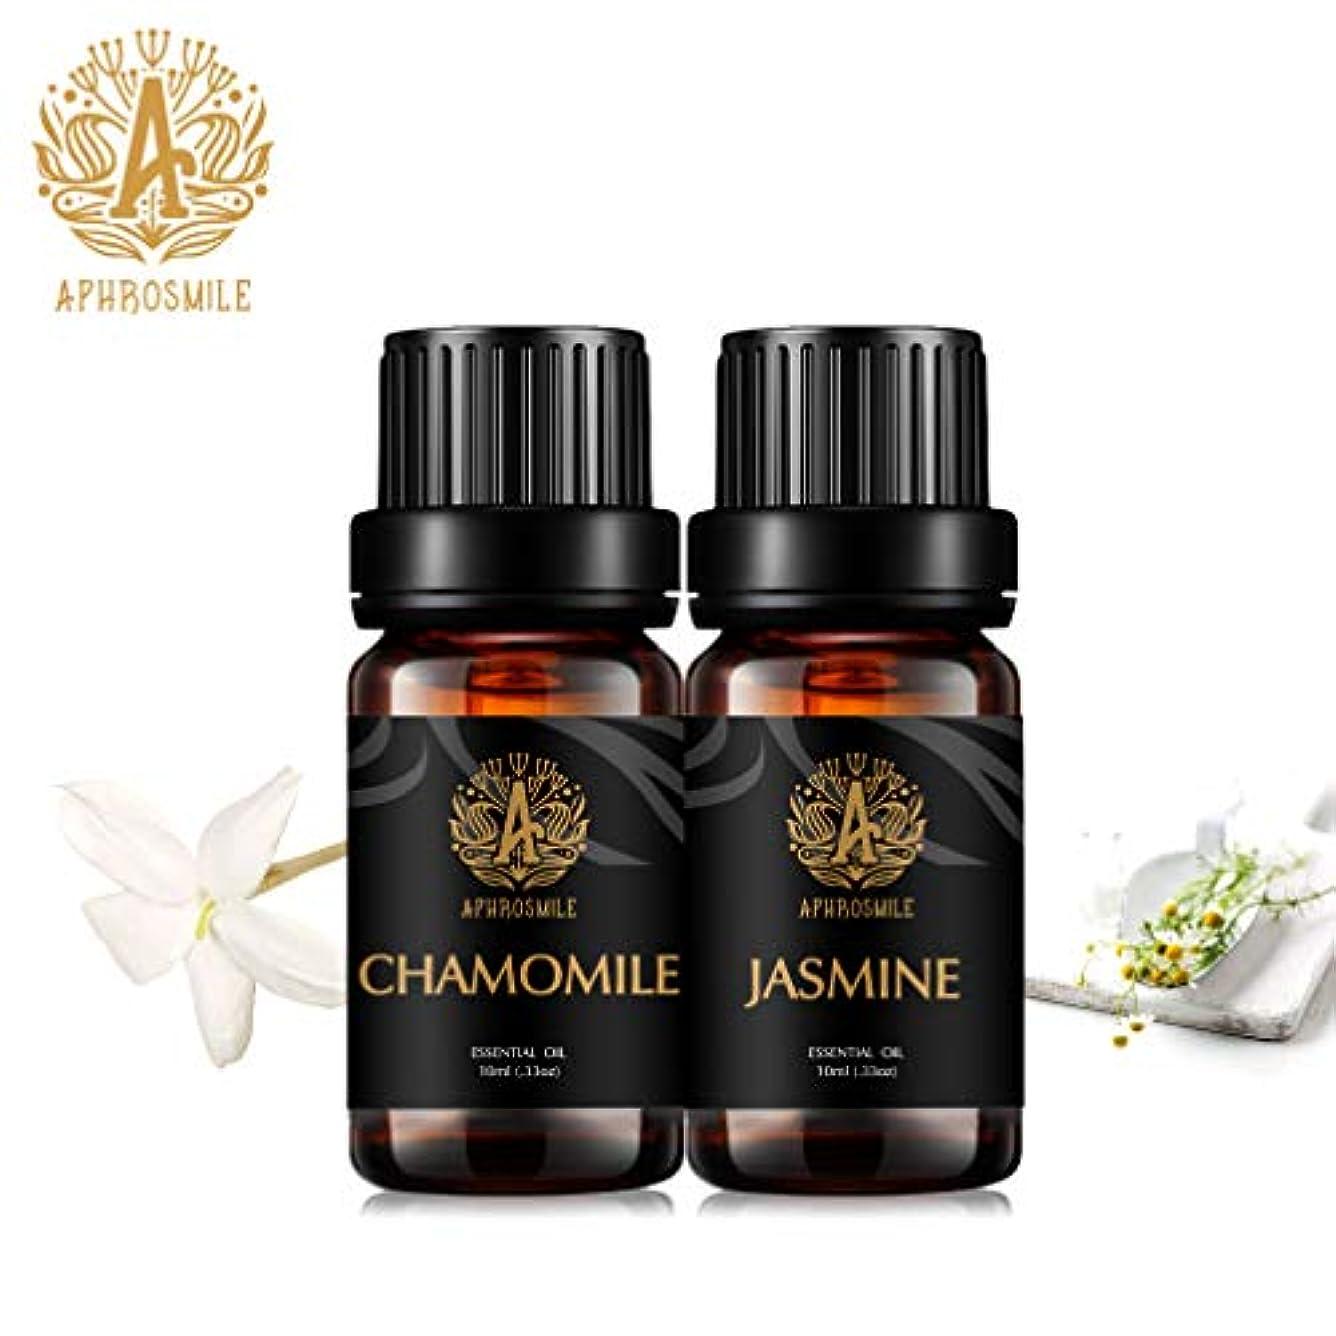 APHORSMILE JP 100% 純粋と天然の精油、カモミール/ジャスミン、2 /10mlボトル - 【エッセンシャルオイル】、アロマテラピー/デイリーケア可能